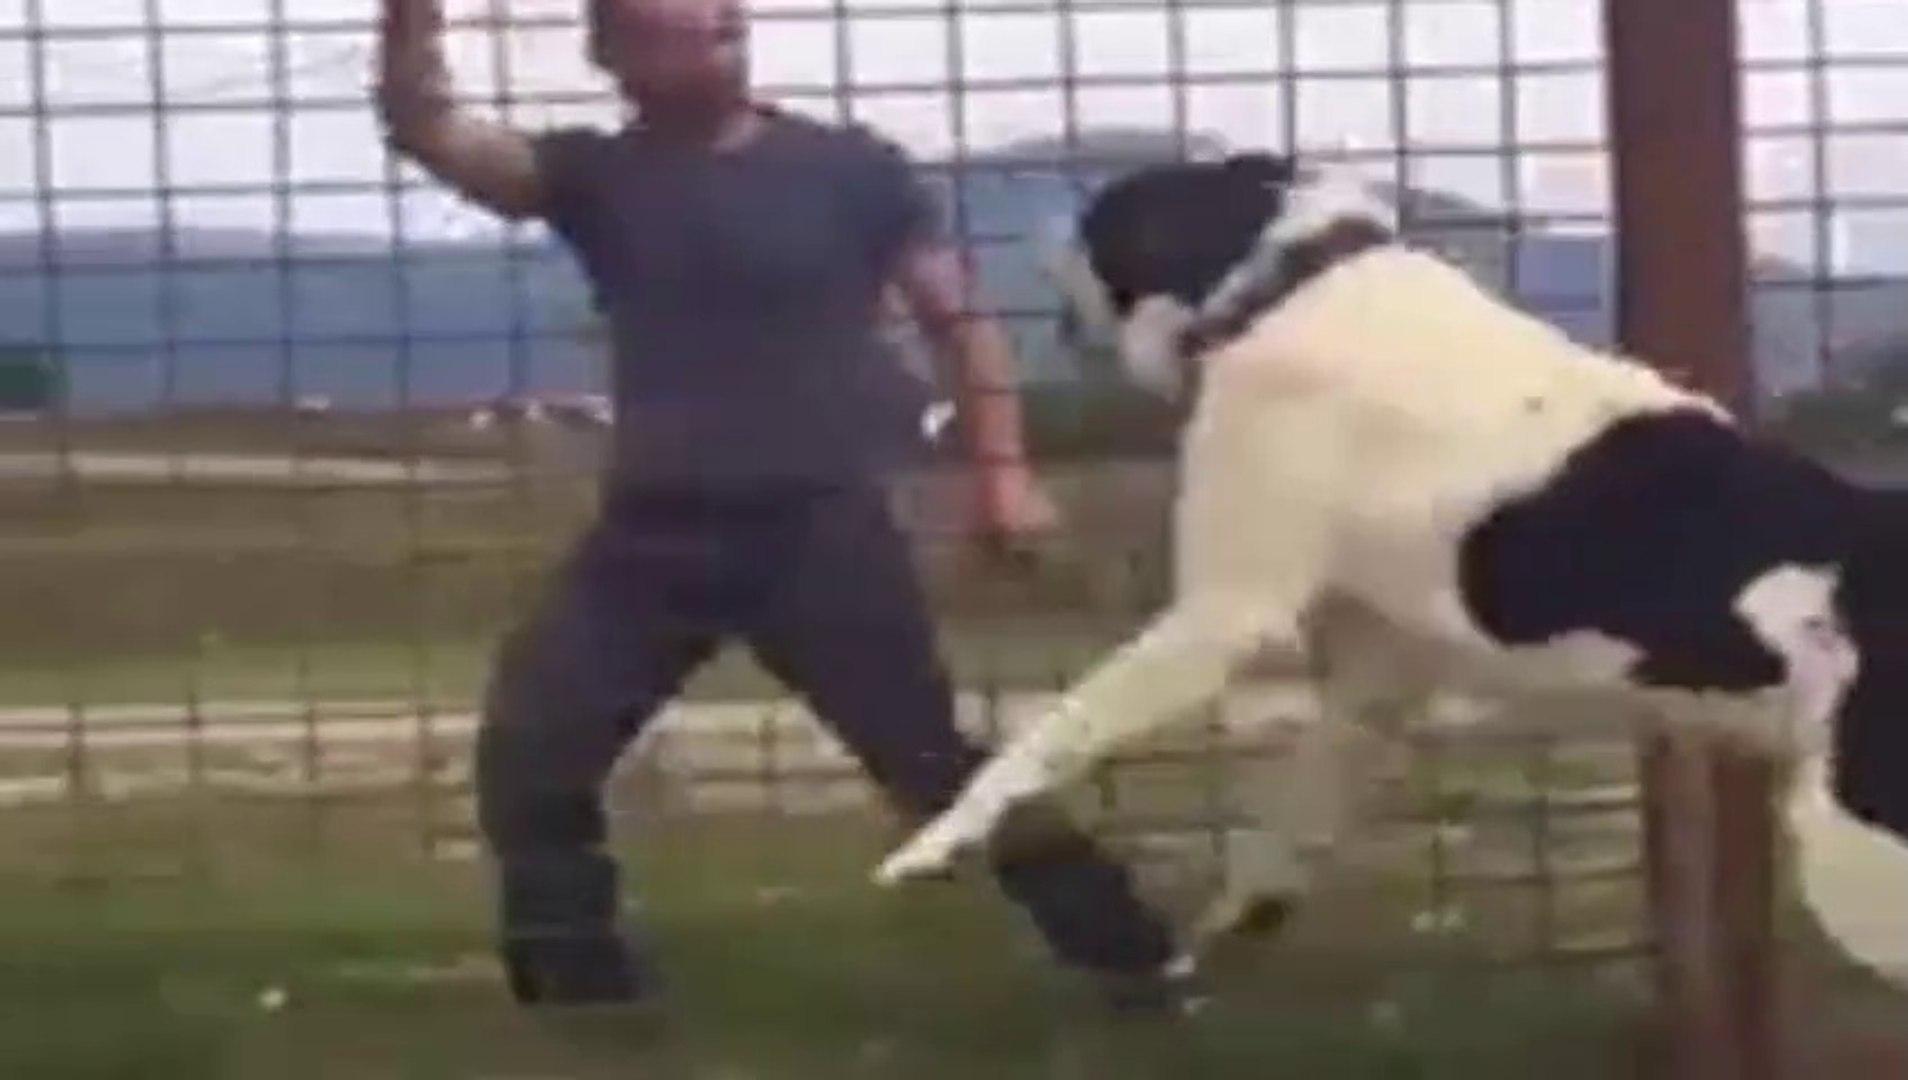 ALABAYI KIZDIRAN ADAM - ANGRY ALABAi SHEPHERD DOG